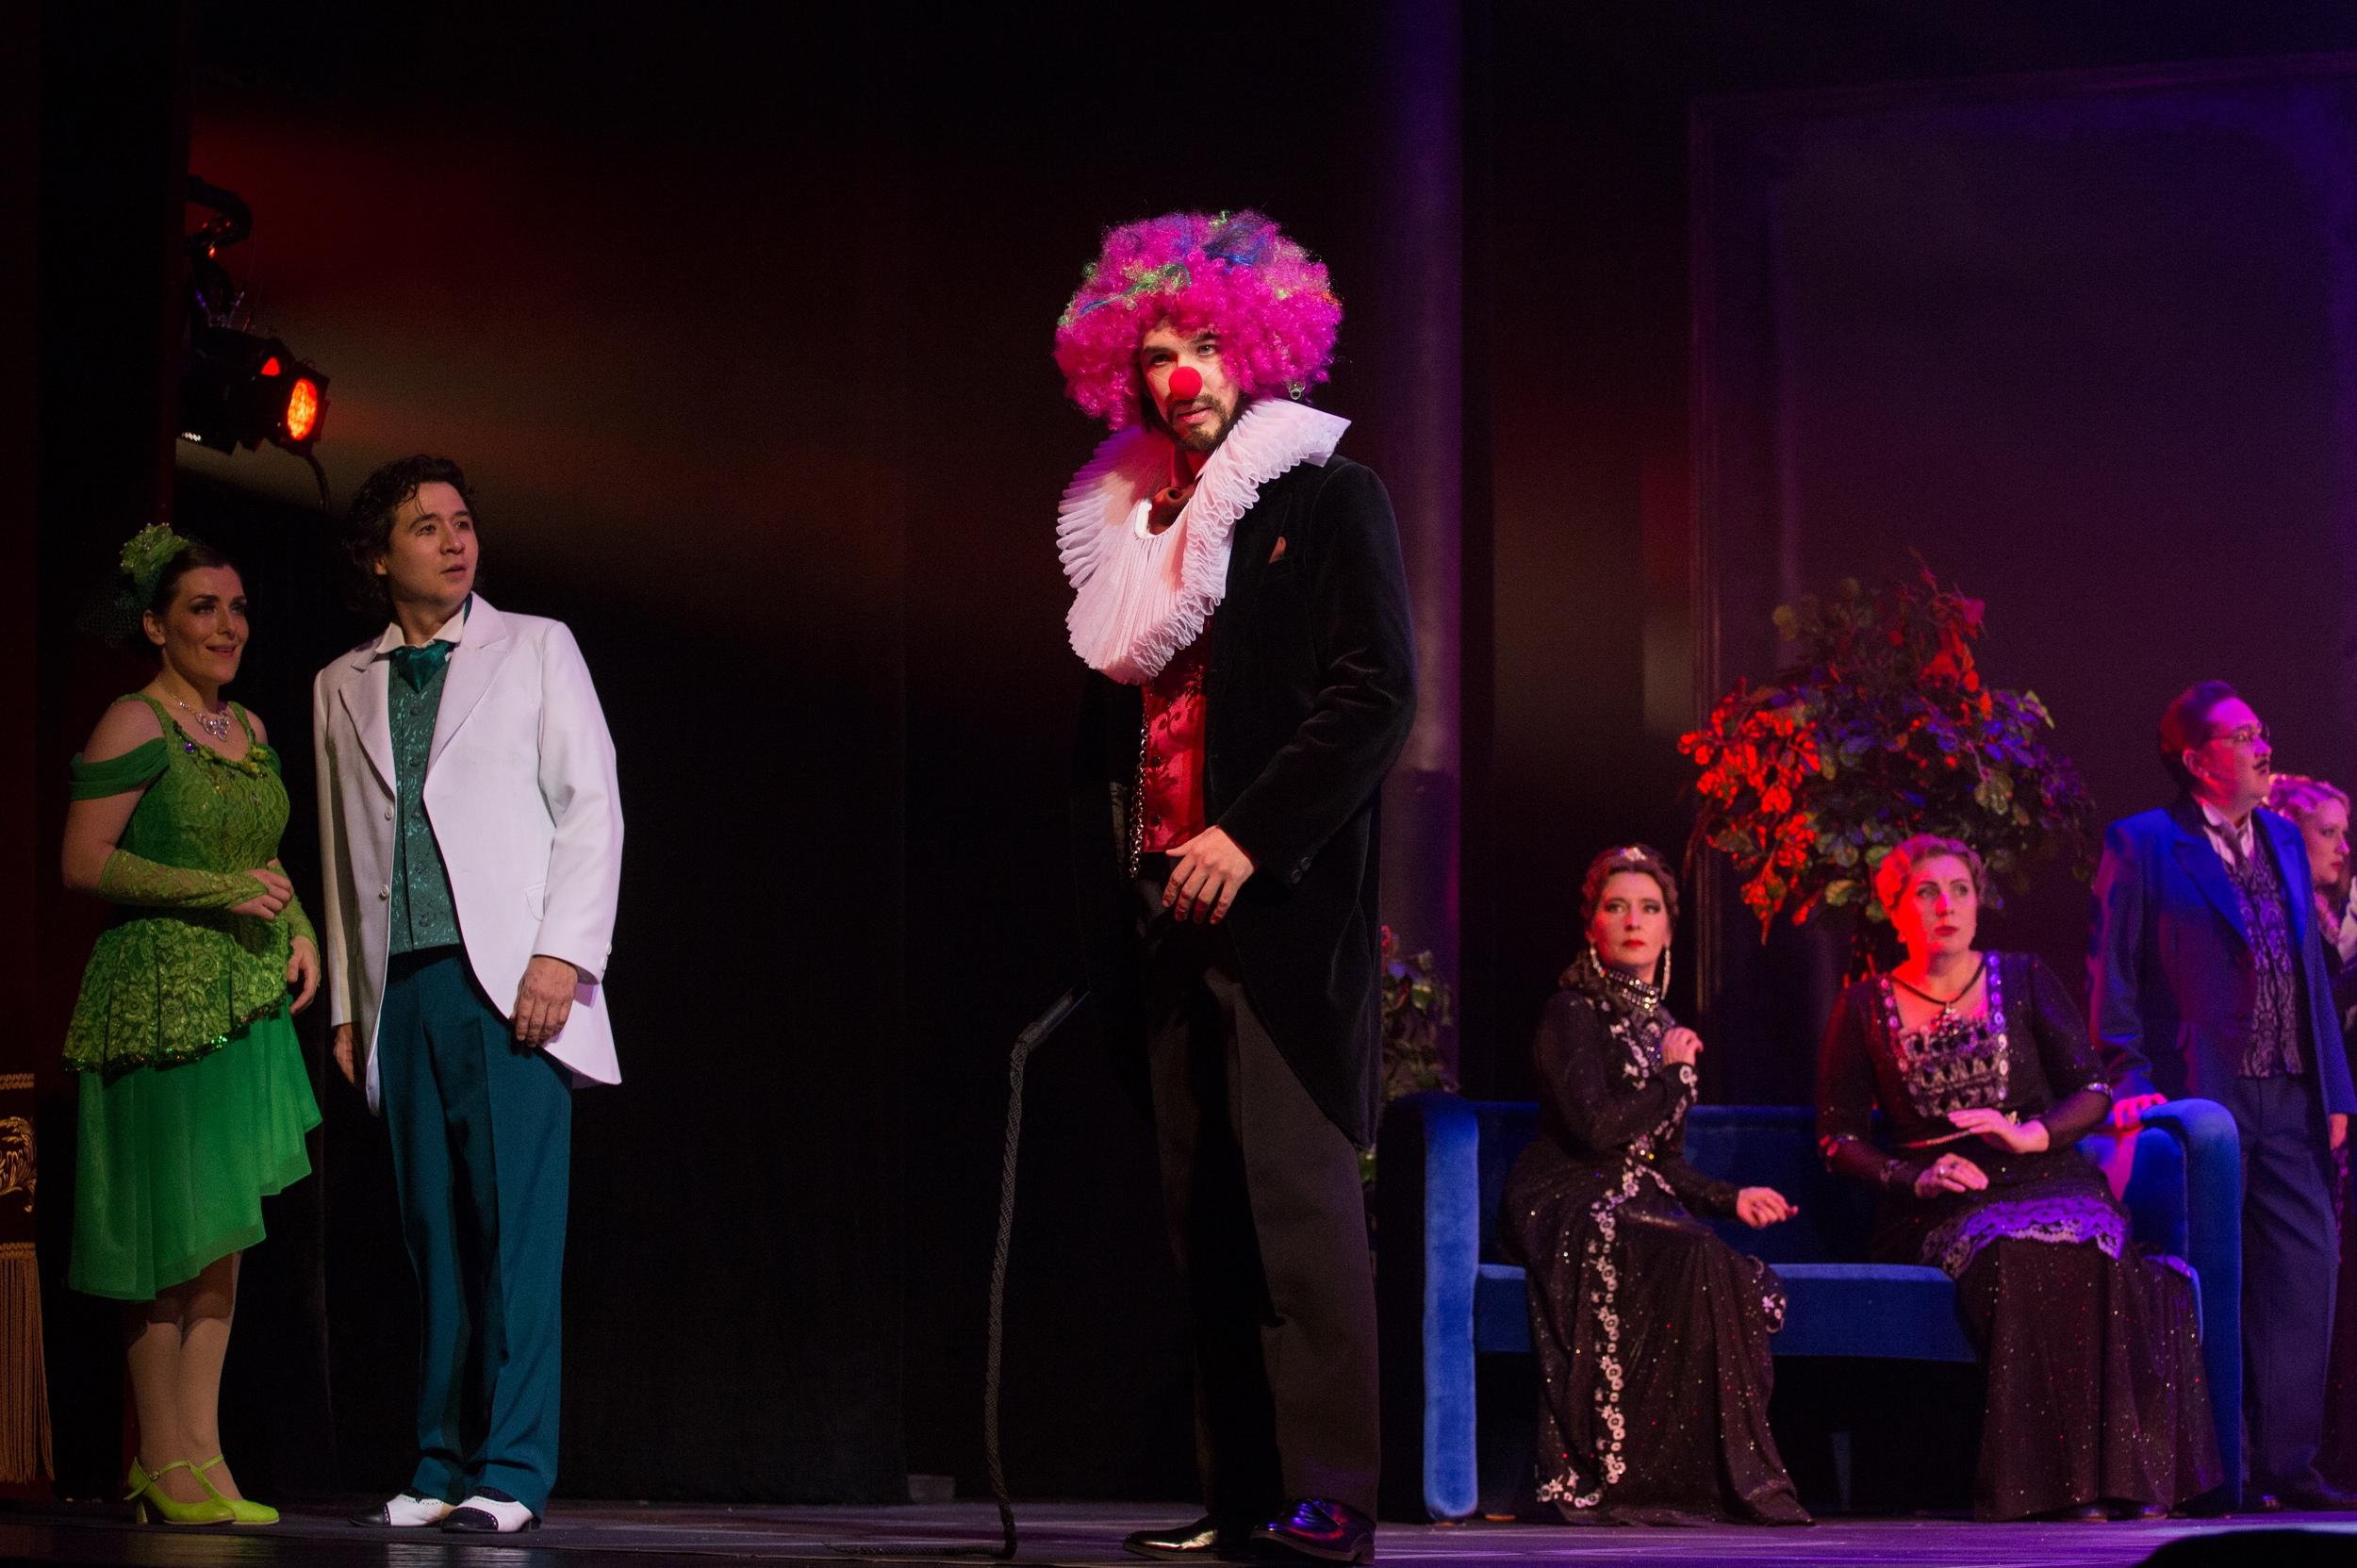 Барон де Кревельяк. Слева стоят Мари и Тони. Фото Виталия Голубева